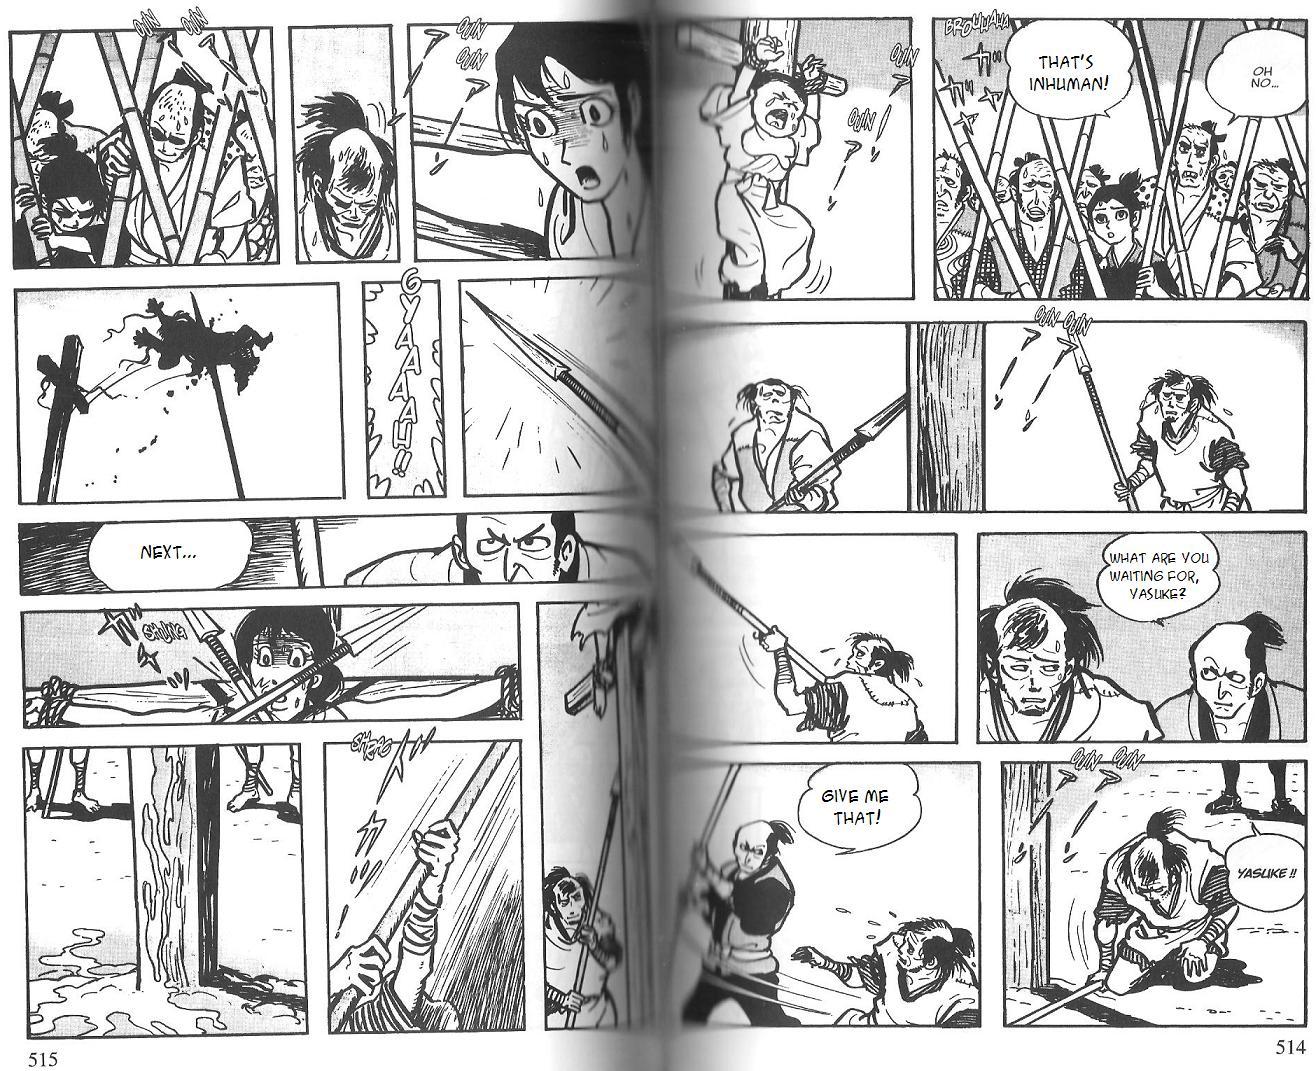 To Me It Feels More Authentic Than The Watered Down Episodic Comics Of Usagi Yojimbo